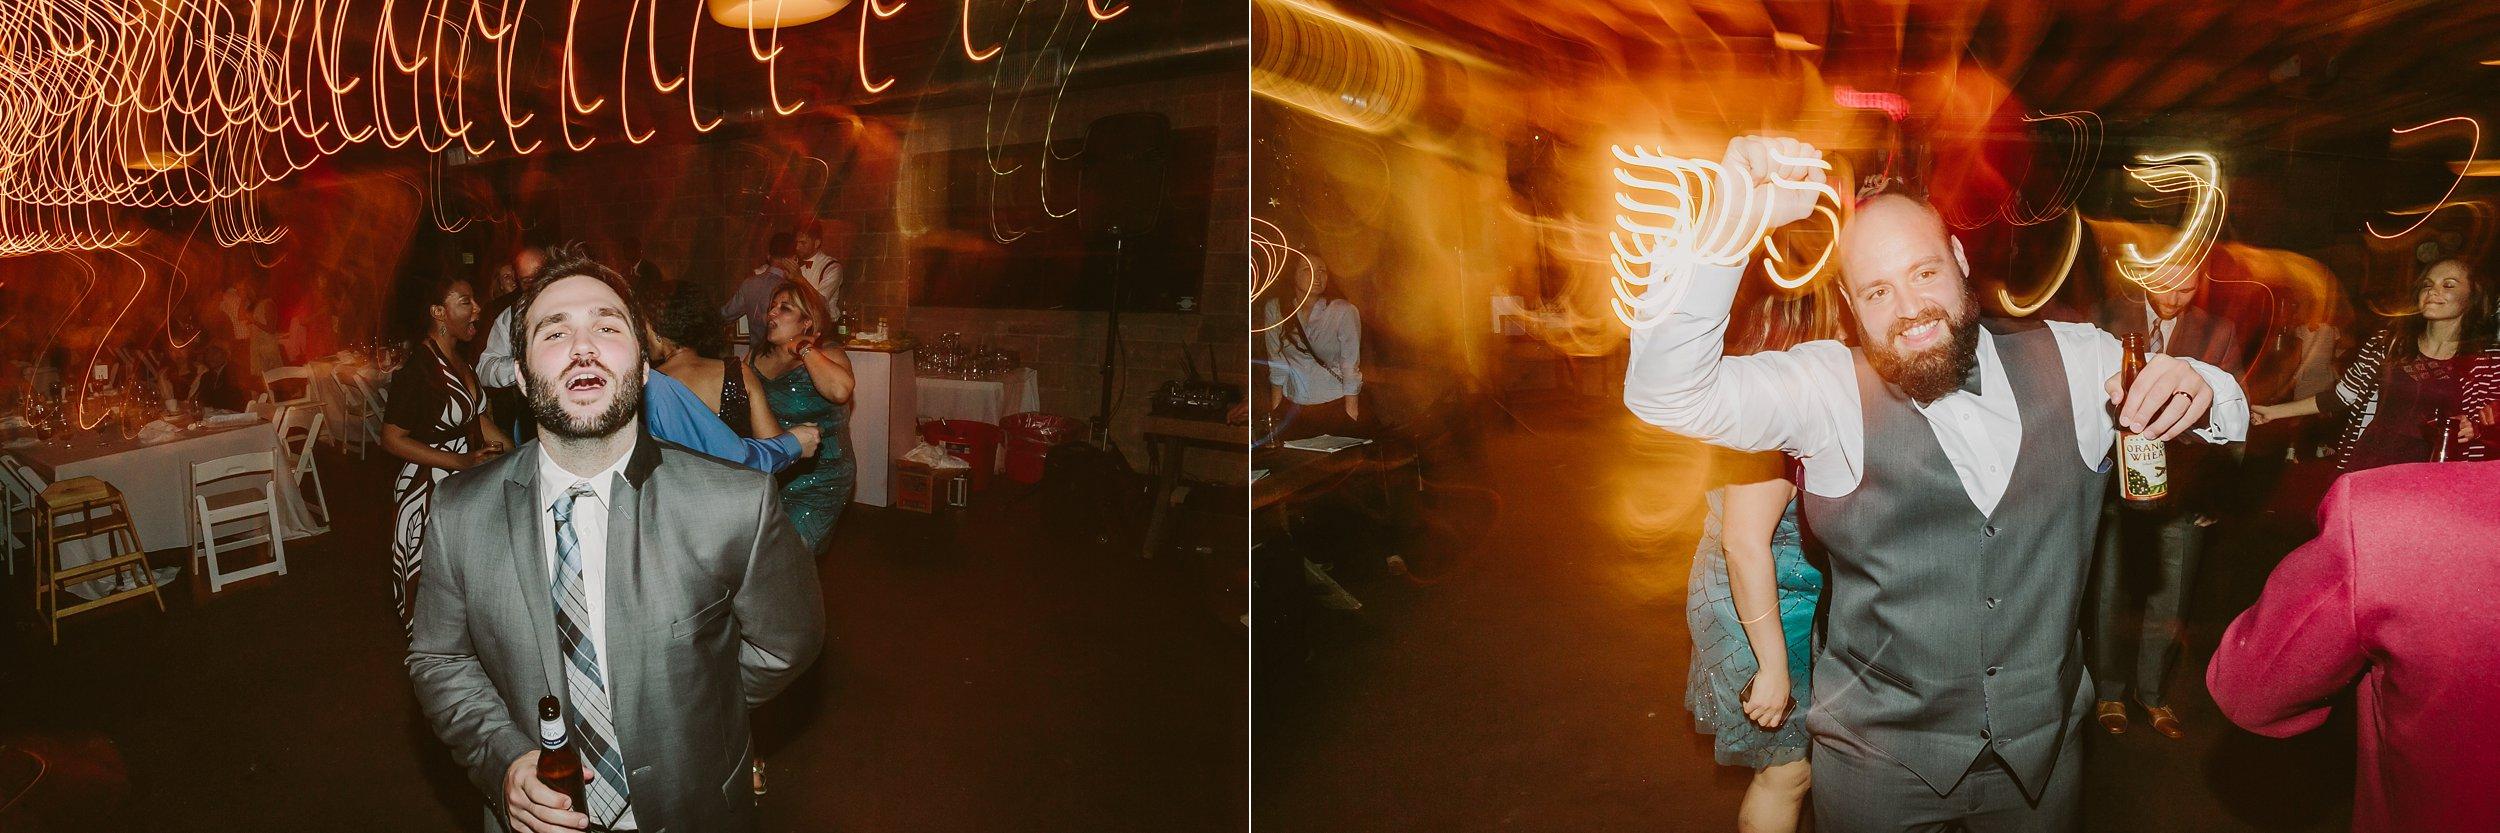 Smoky Hollw Studios Wedding_0046.jpg